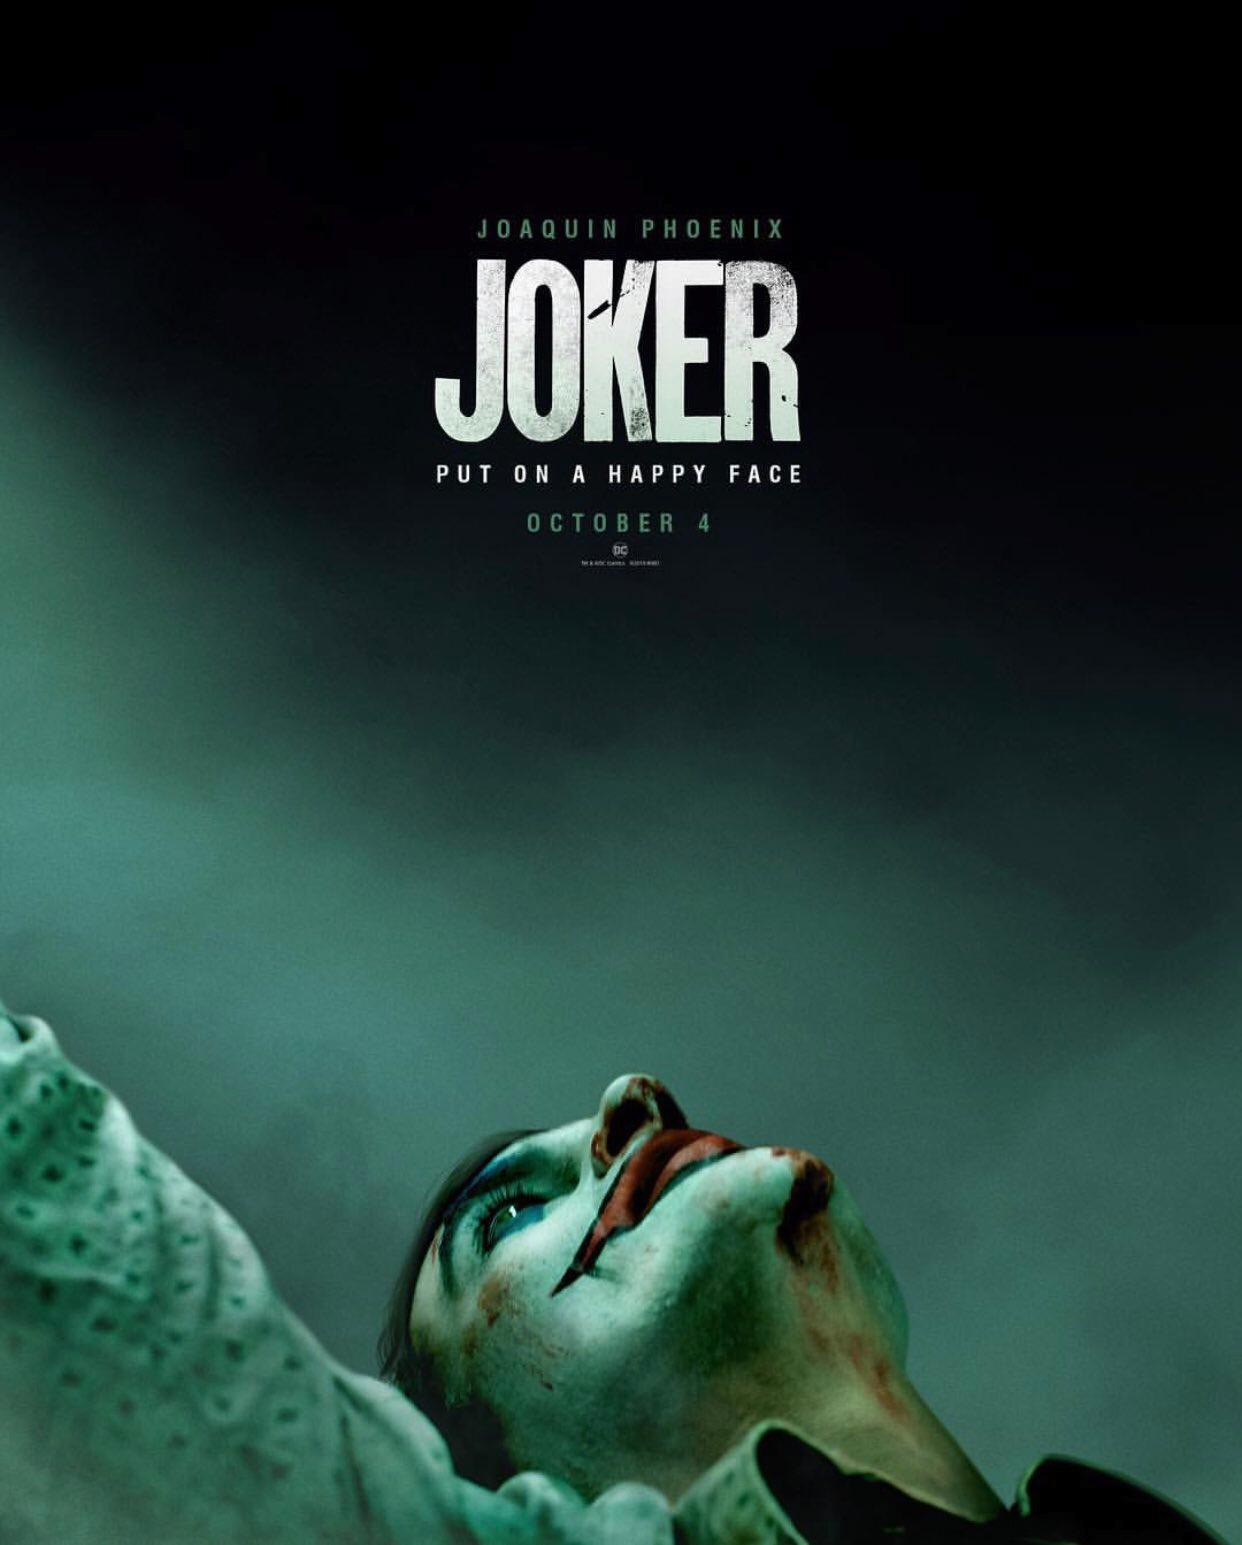 Joker (2019) Teaser Poster - Put On a Happy Face